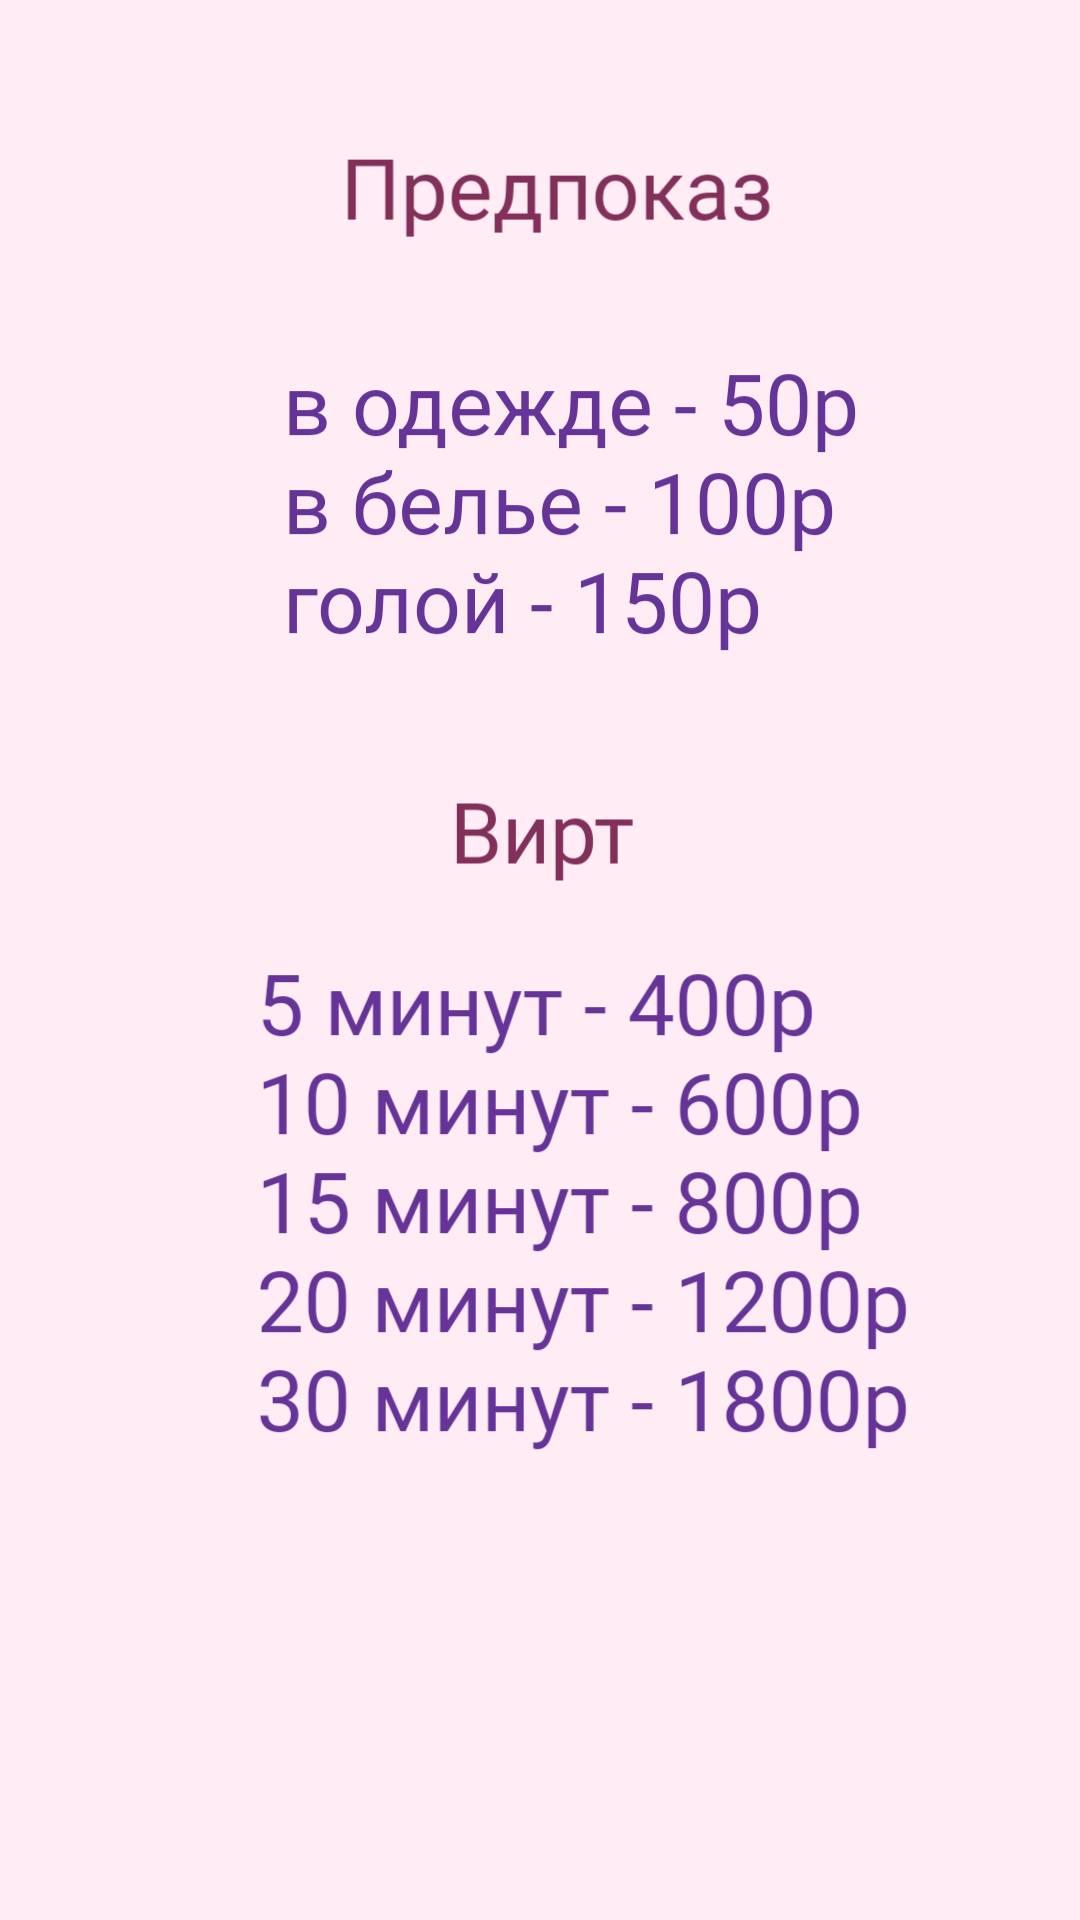 imgpsh_fullsize_anim (18)